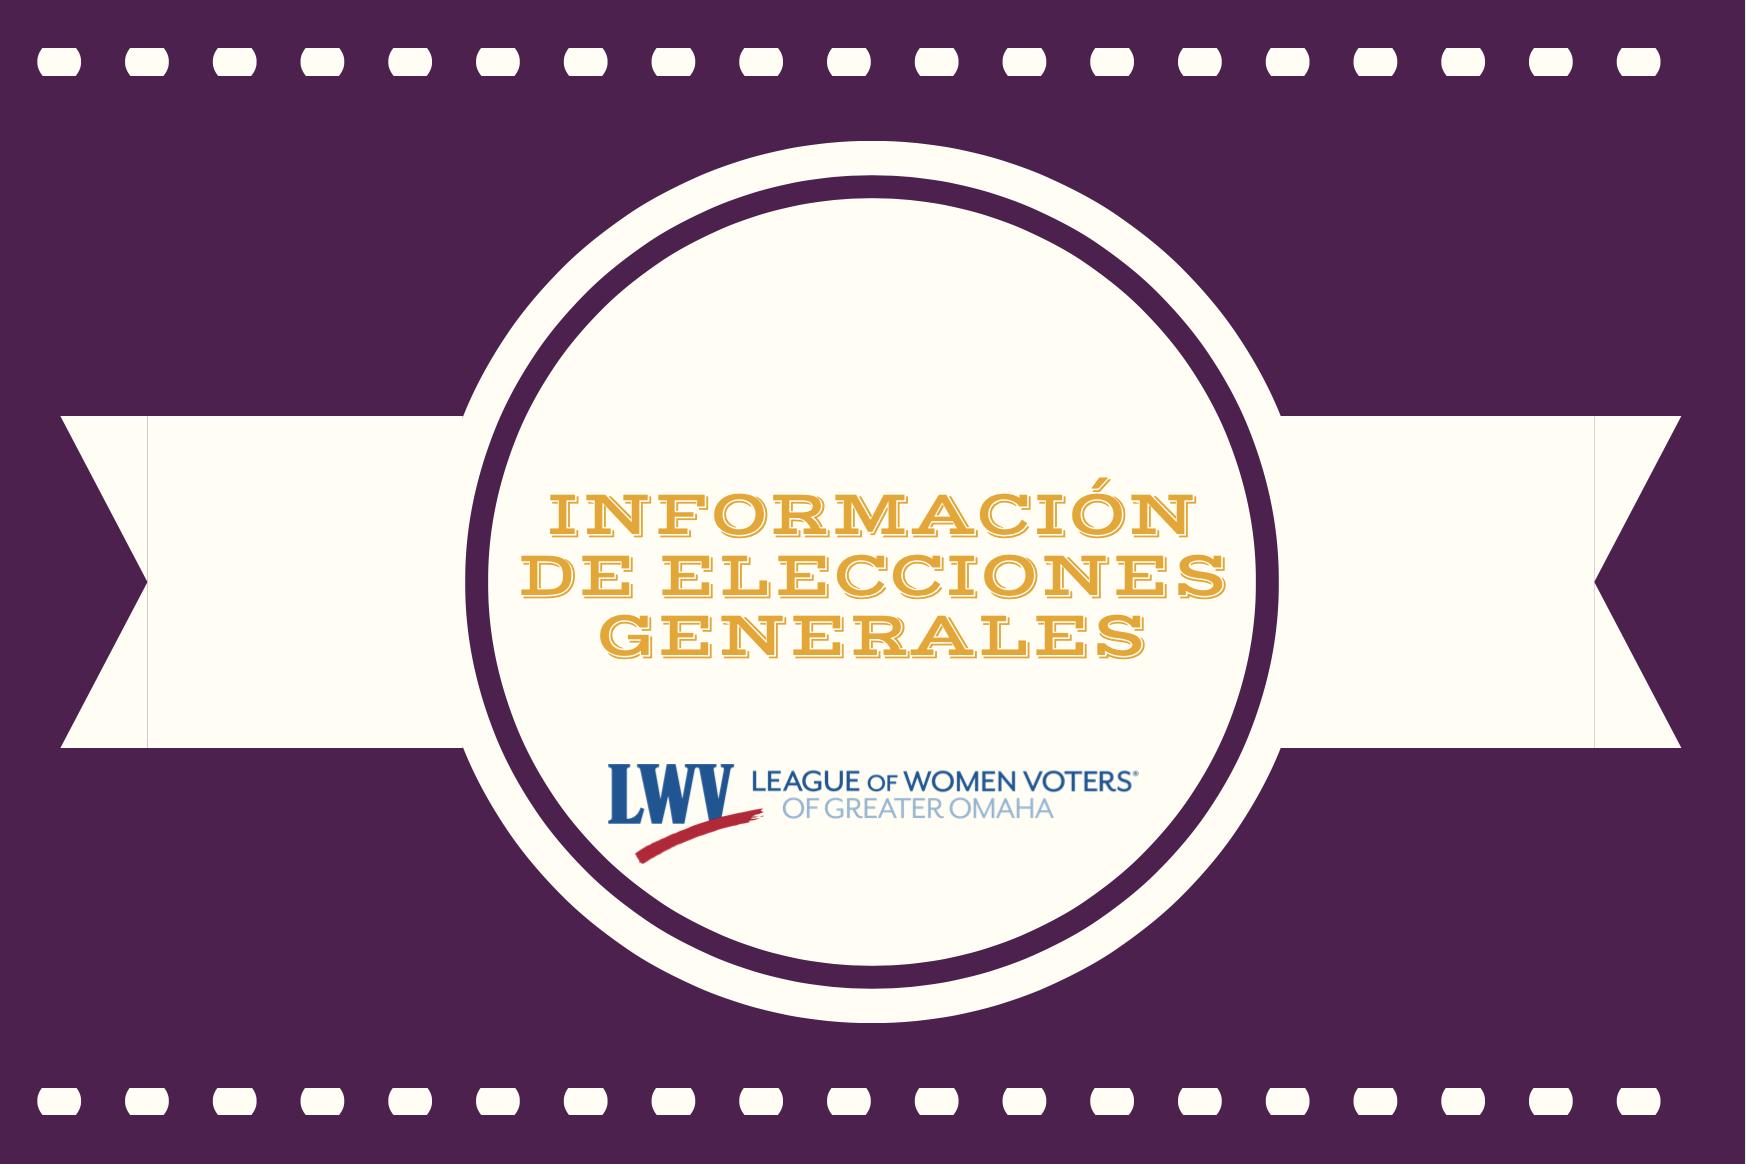 general election information spanish 2020